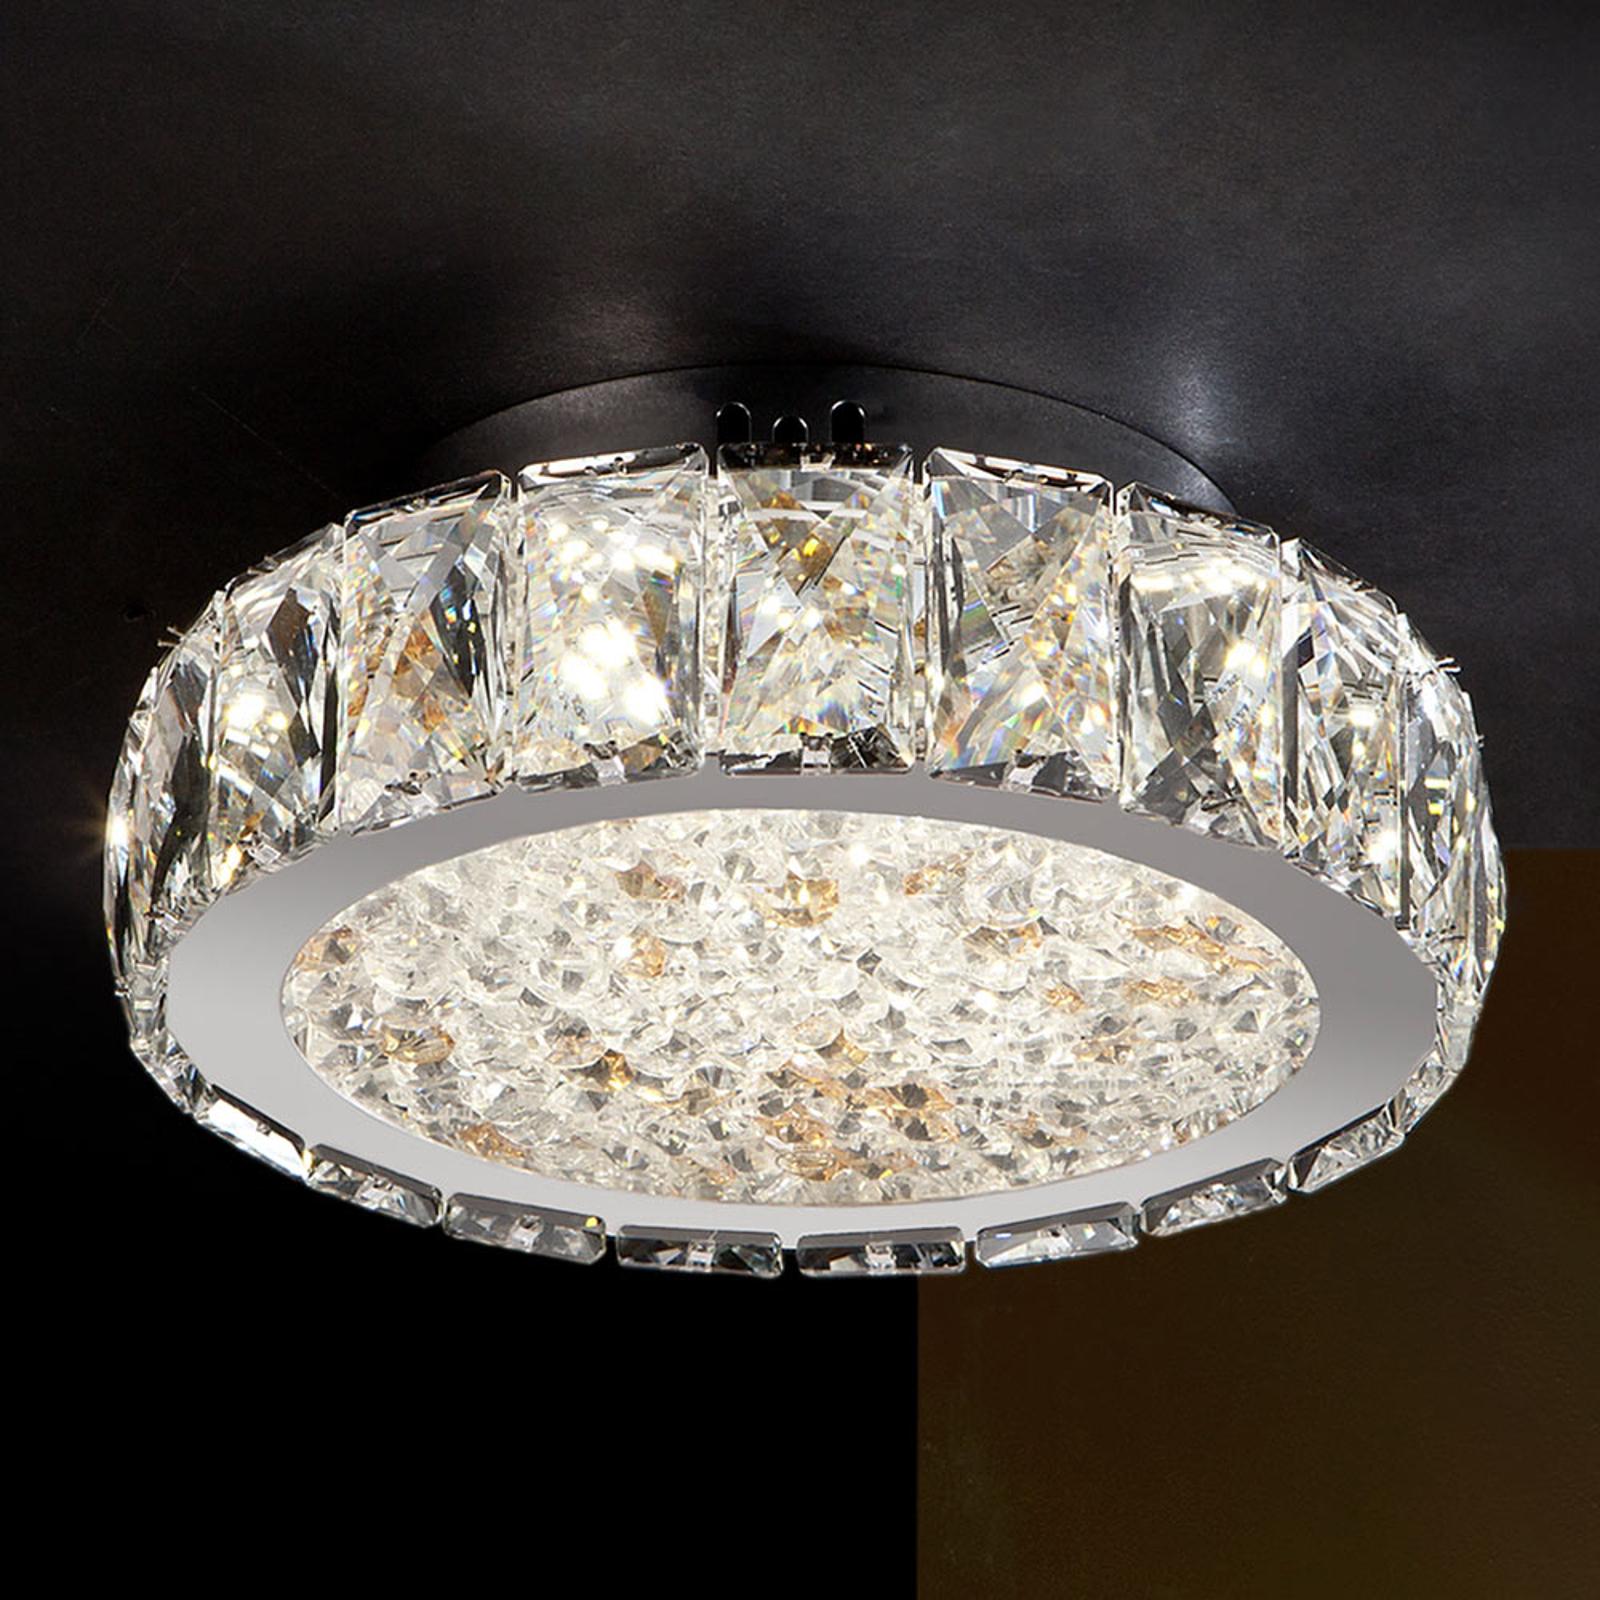 LED-kattovalaisin Dana, kristalleja, Ø 23 cm